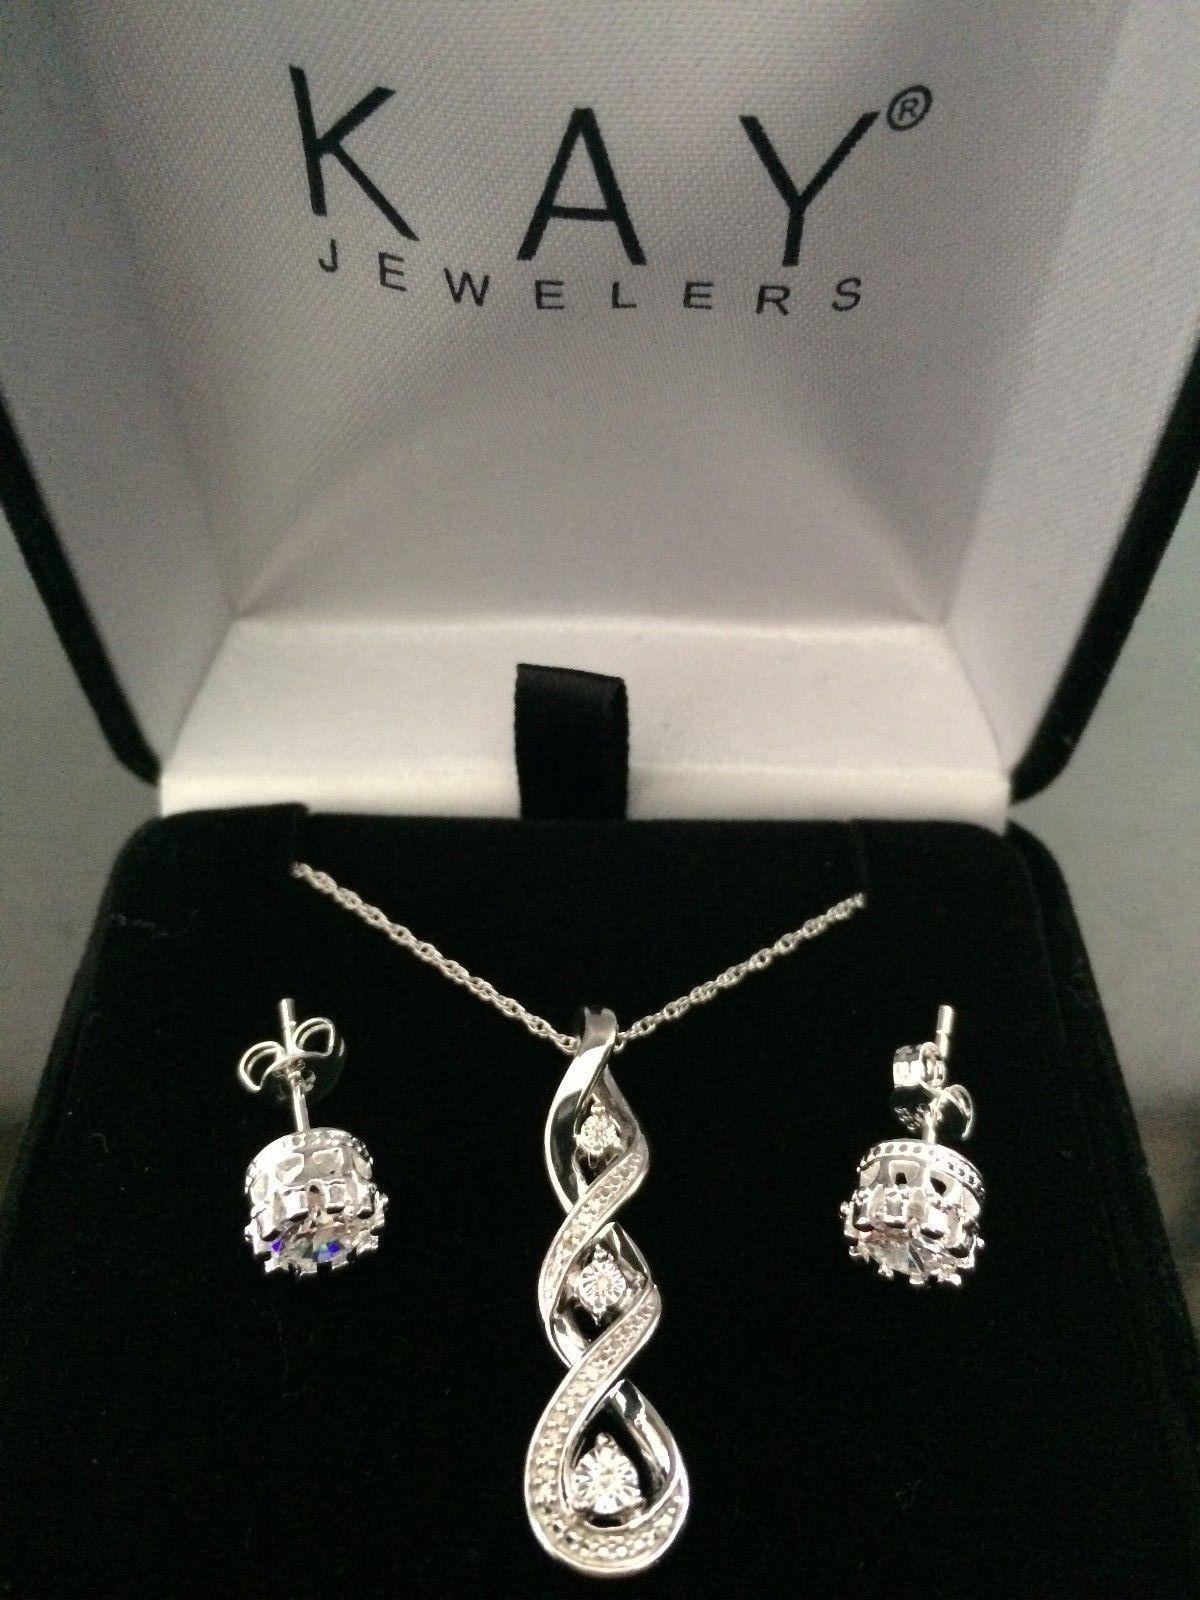 63177727d Fine Jewelry 4196: *New! Kay Jewelry Diamond Necklace + Earrings Jared  Zales Heart Anniversary Gift -> BUY IT NOW ONLY: $86.22 on #eBay #jewelry  #diamond ...